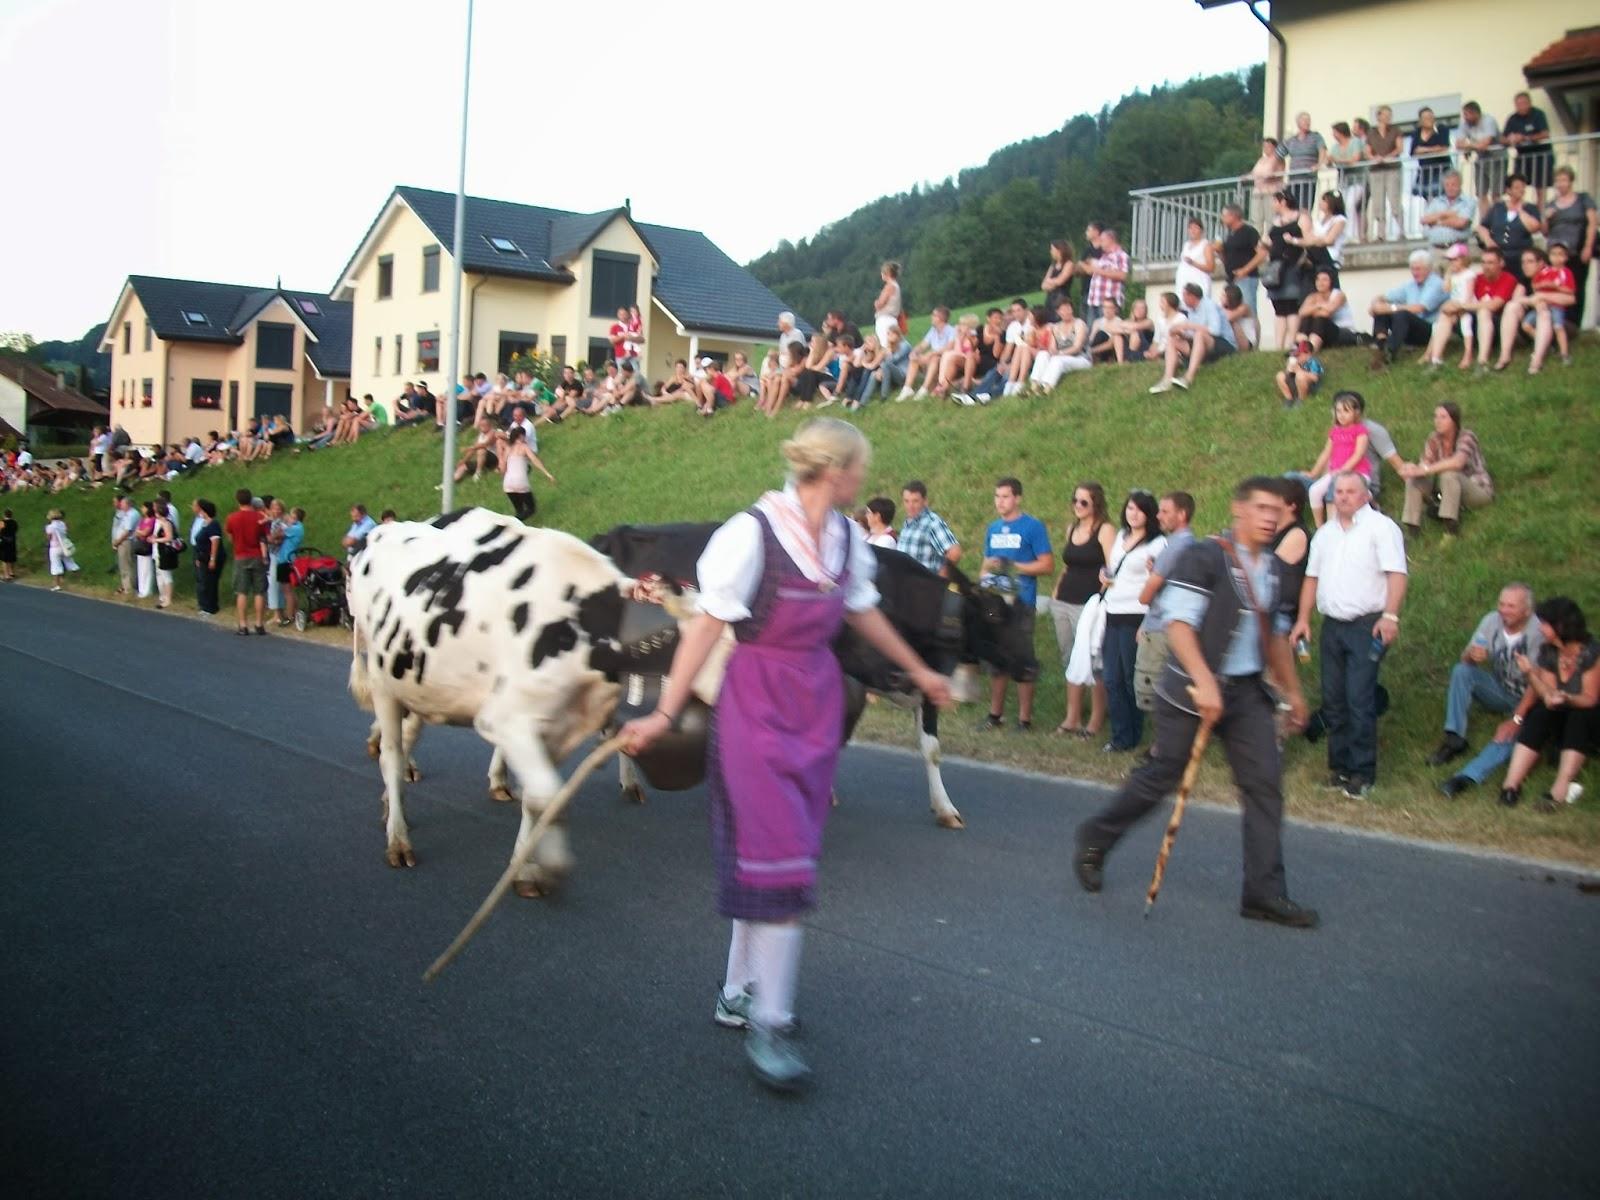 10 curiosidades sobre a Suíça.